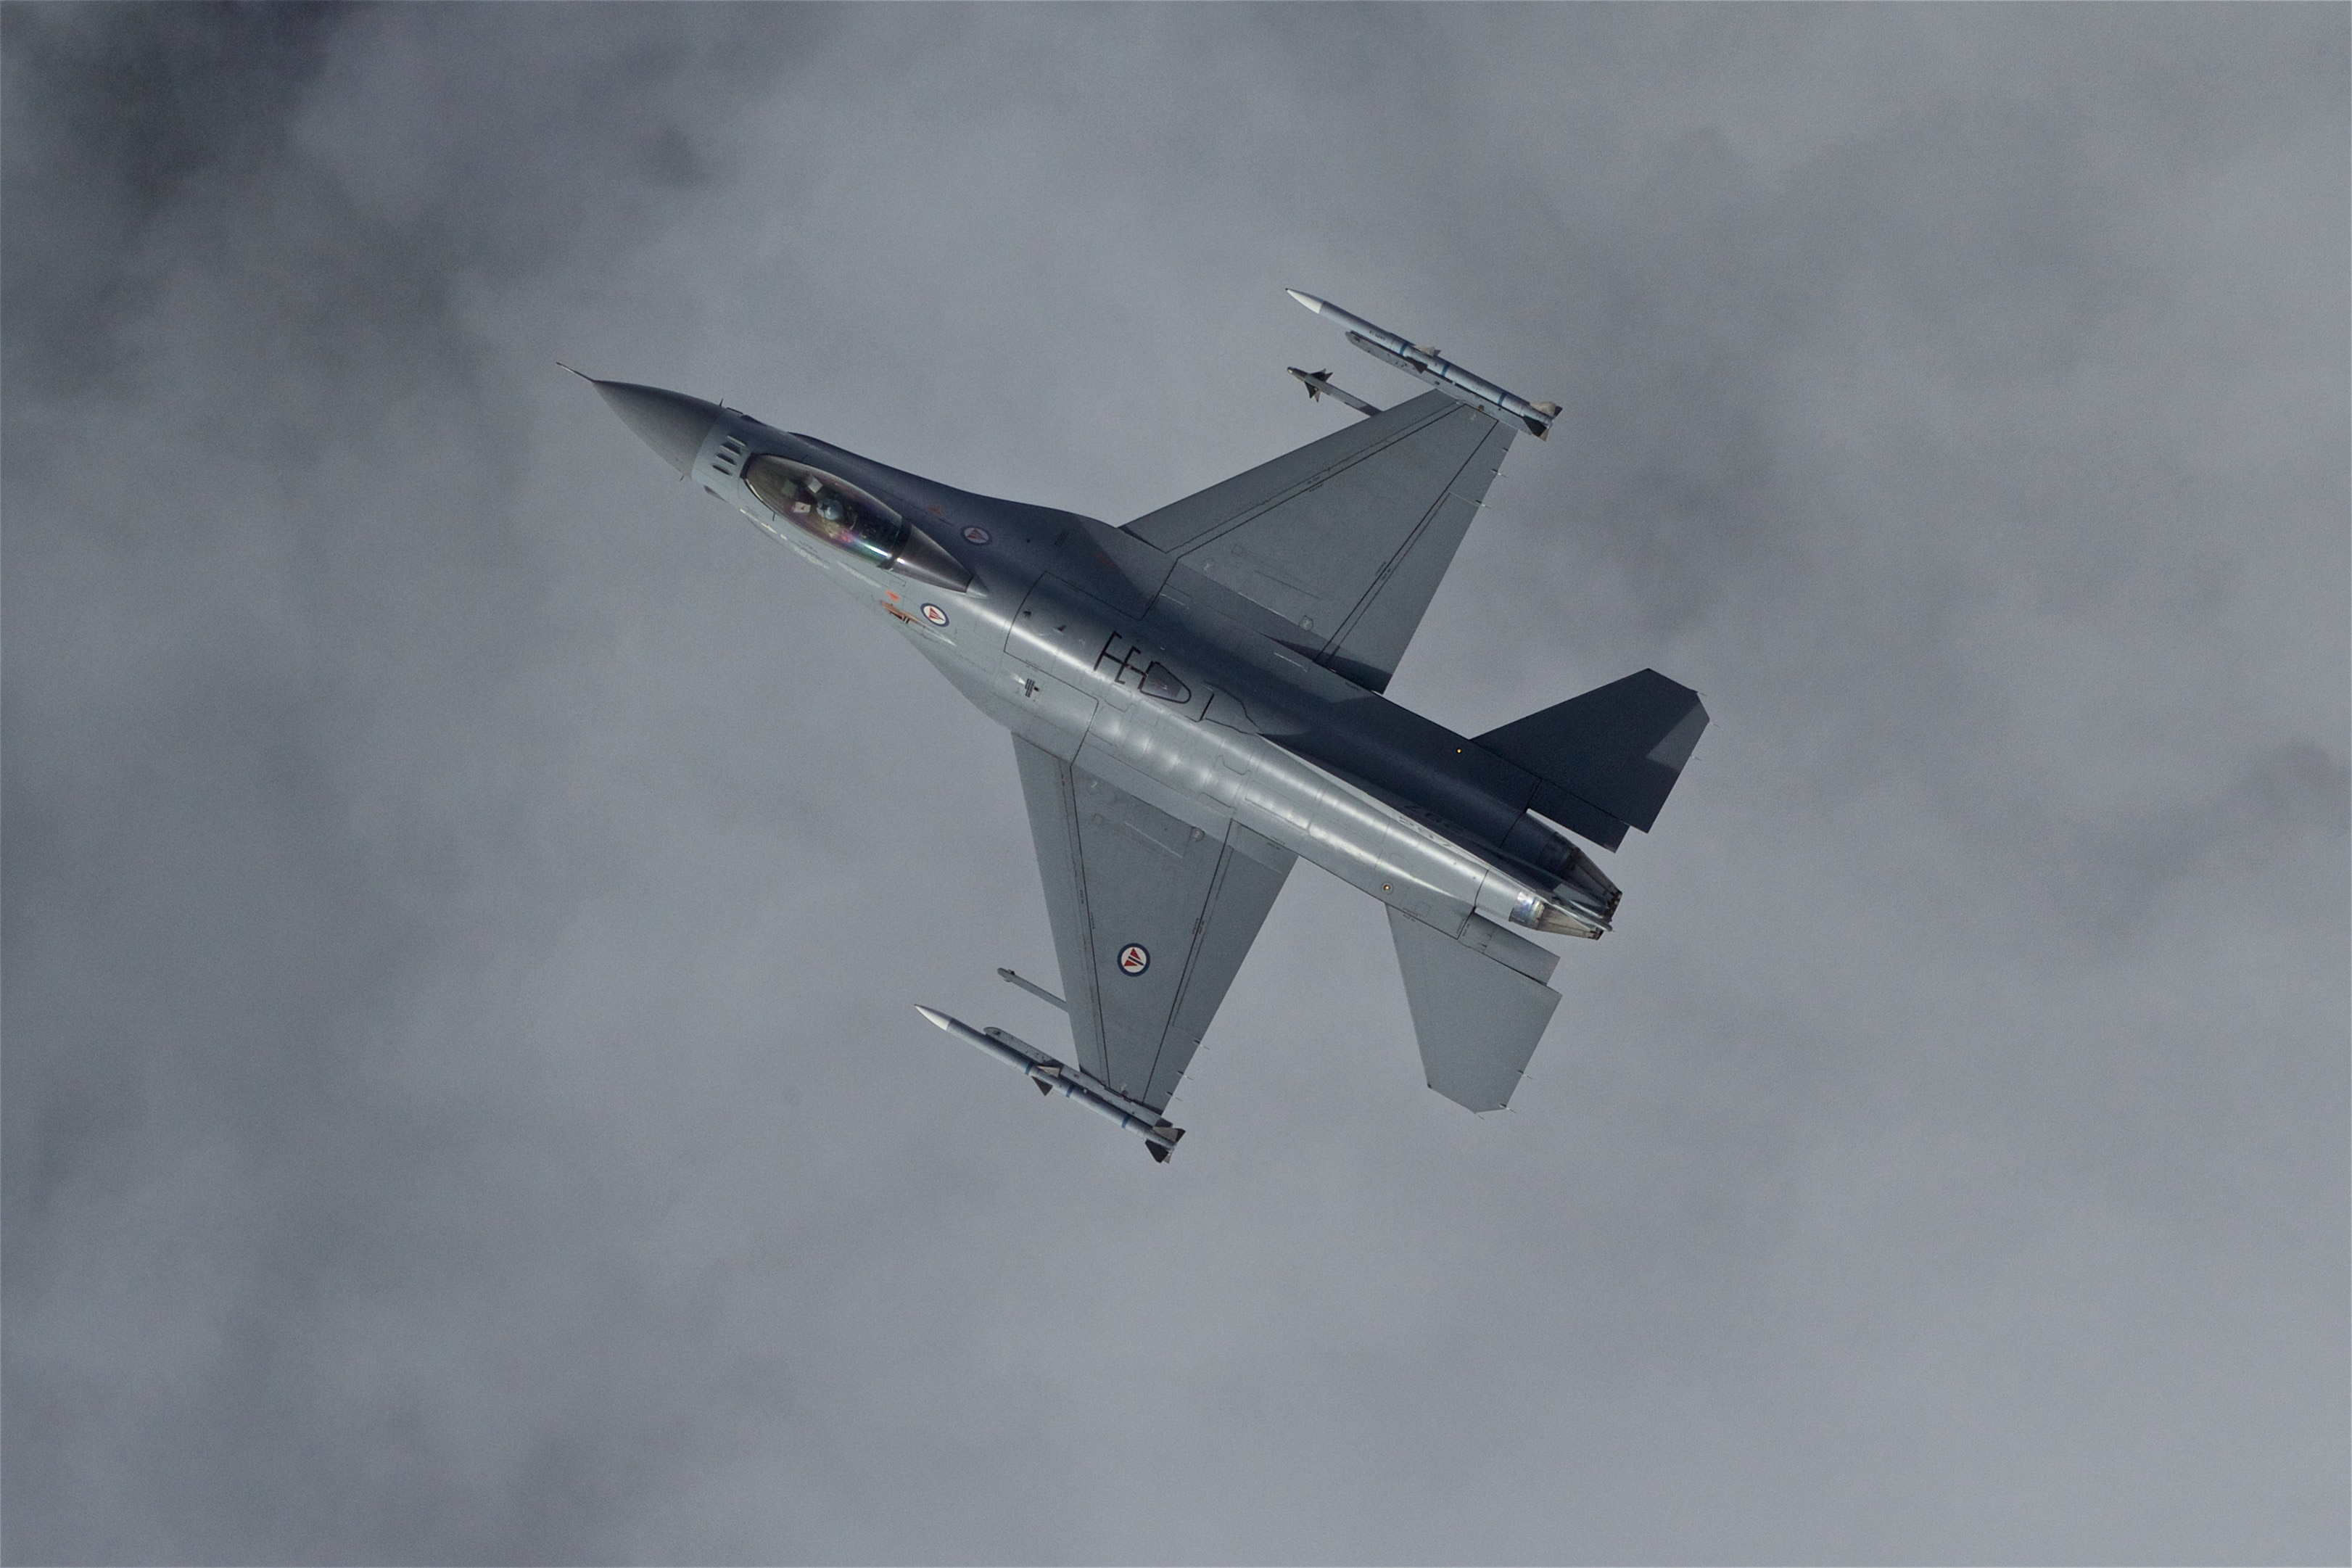 As F-35 Comes Online, Norway to Scrap F-16 Fleet